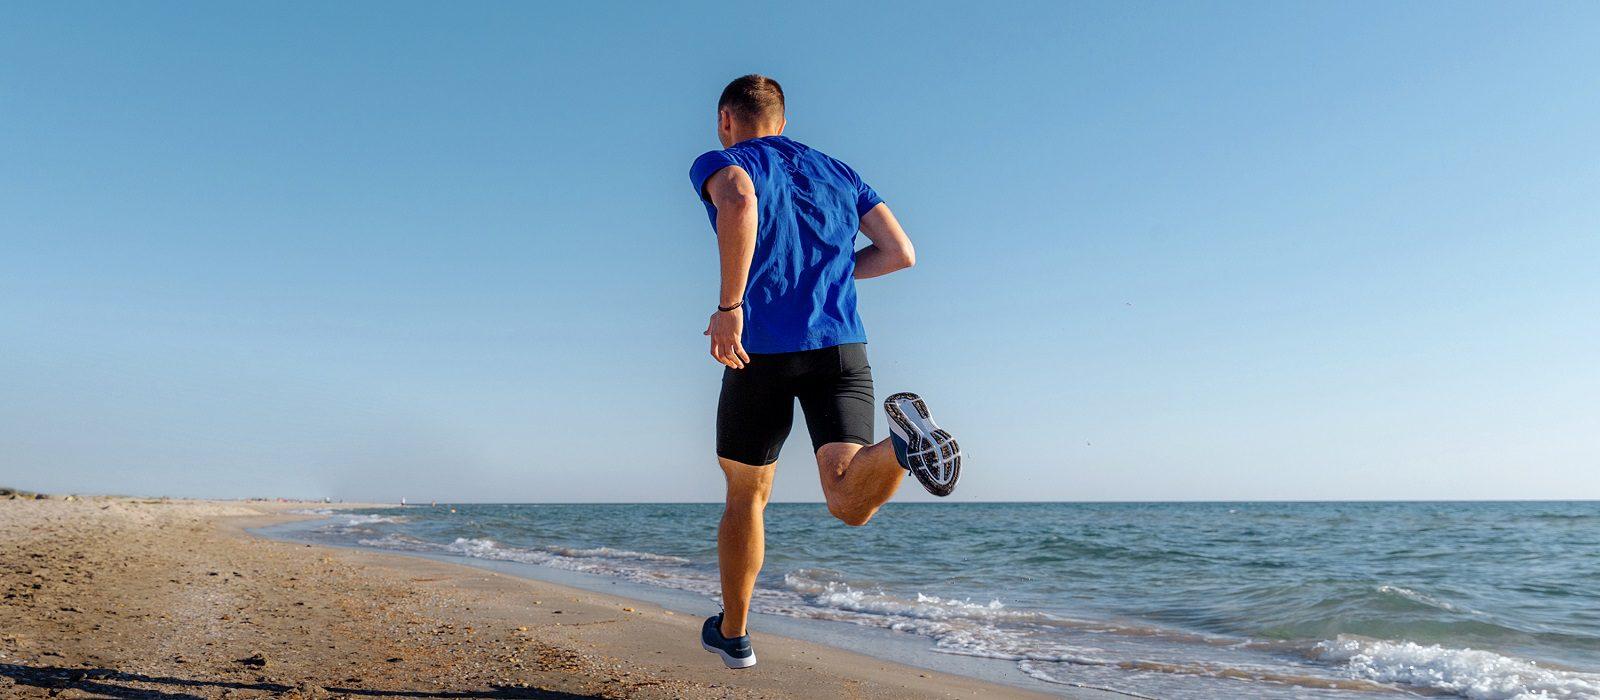 back man athlete running on sandy beach background blue sky